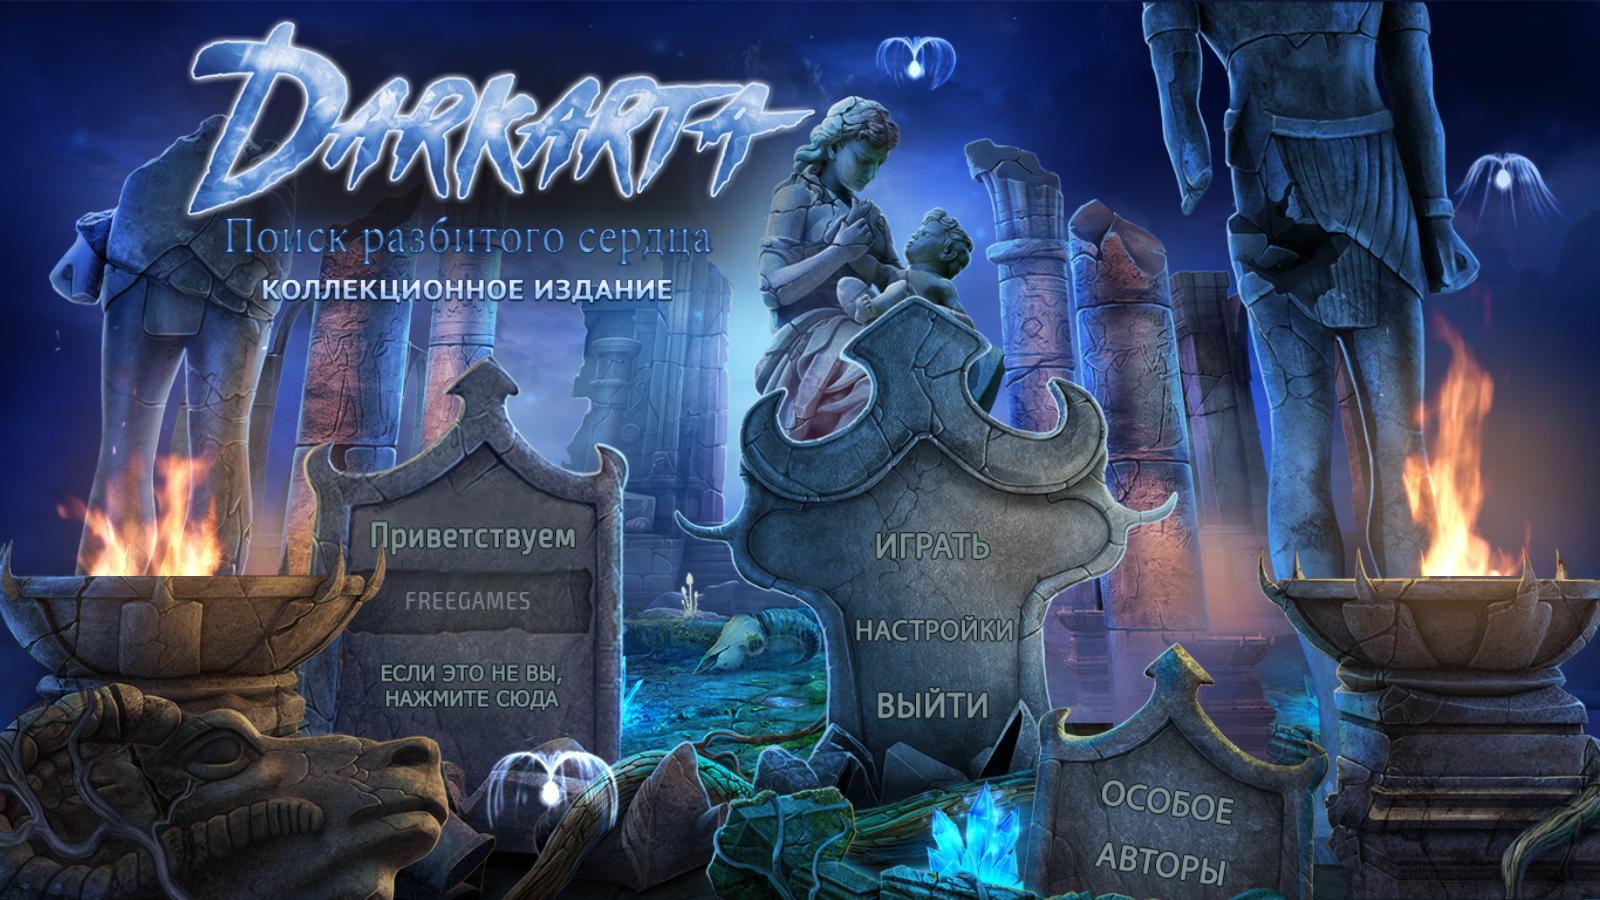 Darkarta: Поиск разбитого сердца. Коллекционное издание | Darkarta: A Broken Heart's Quest CE (Rus)